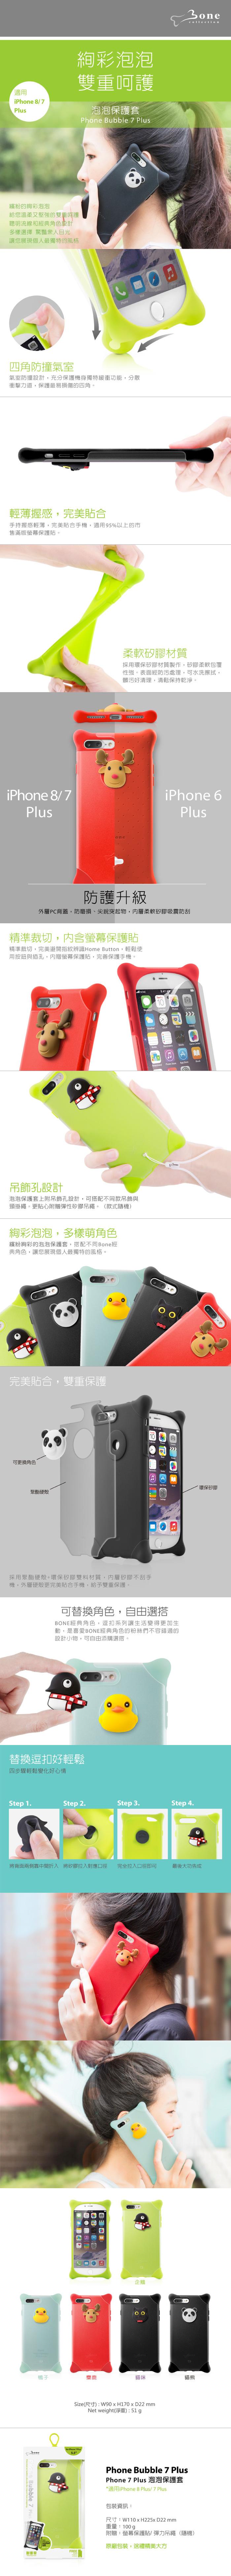 Bone iPhone 8 Plus / 7 Plus 四角防撞 泡泡保護套 - 貓咪